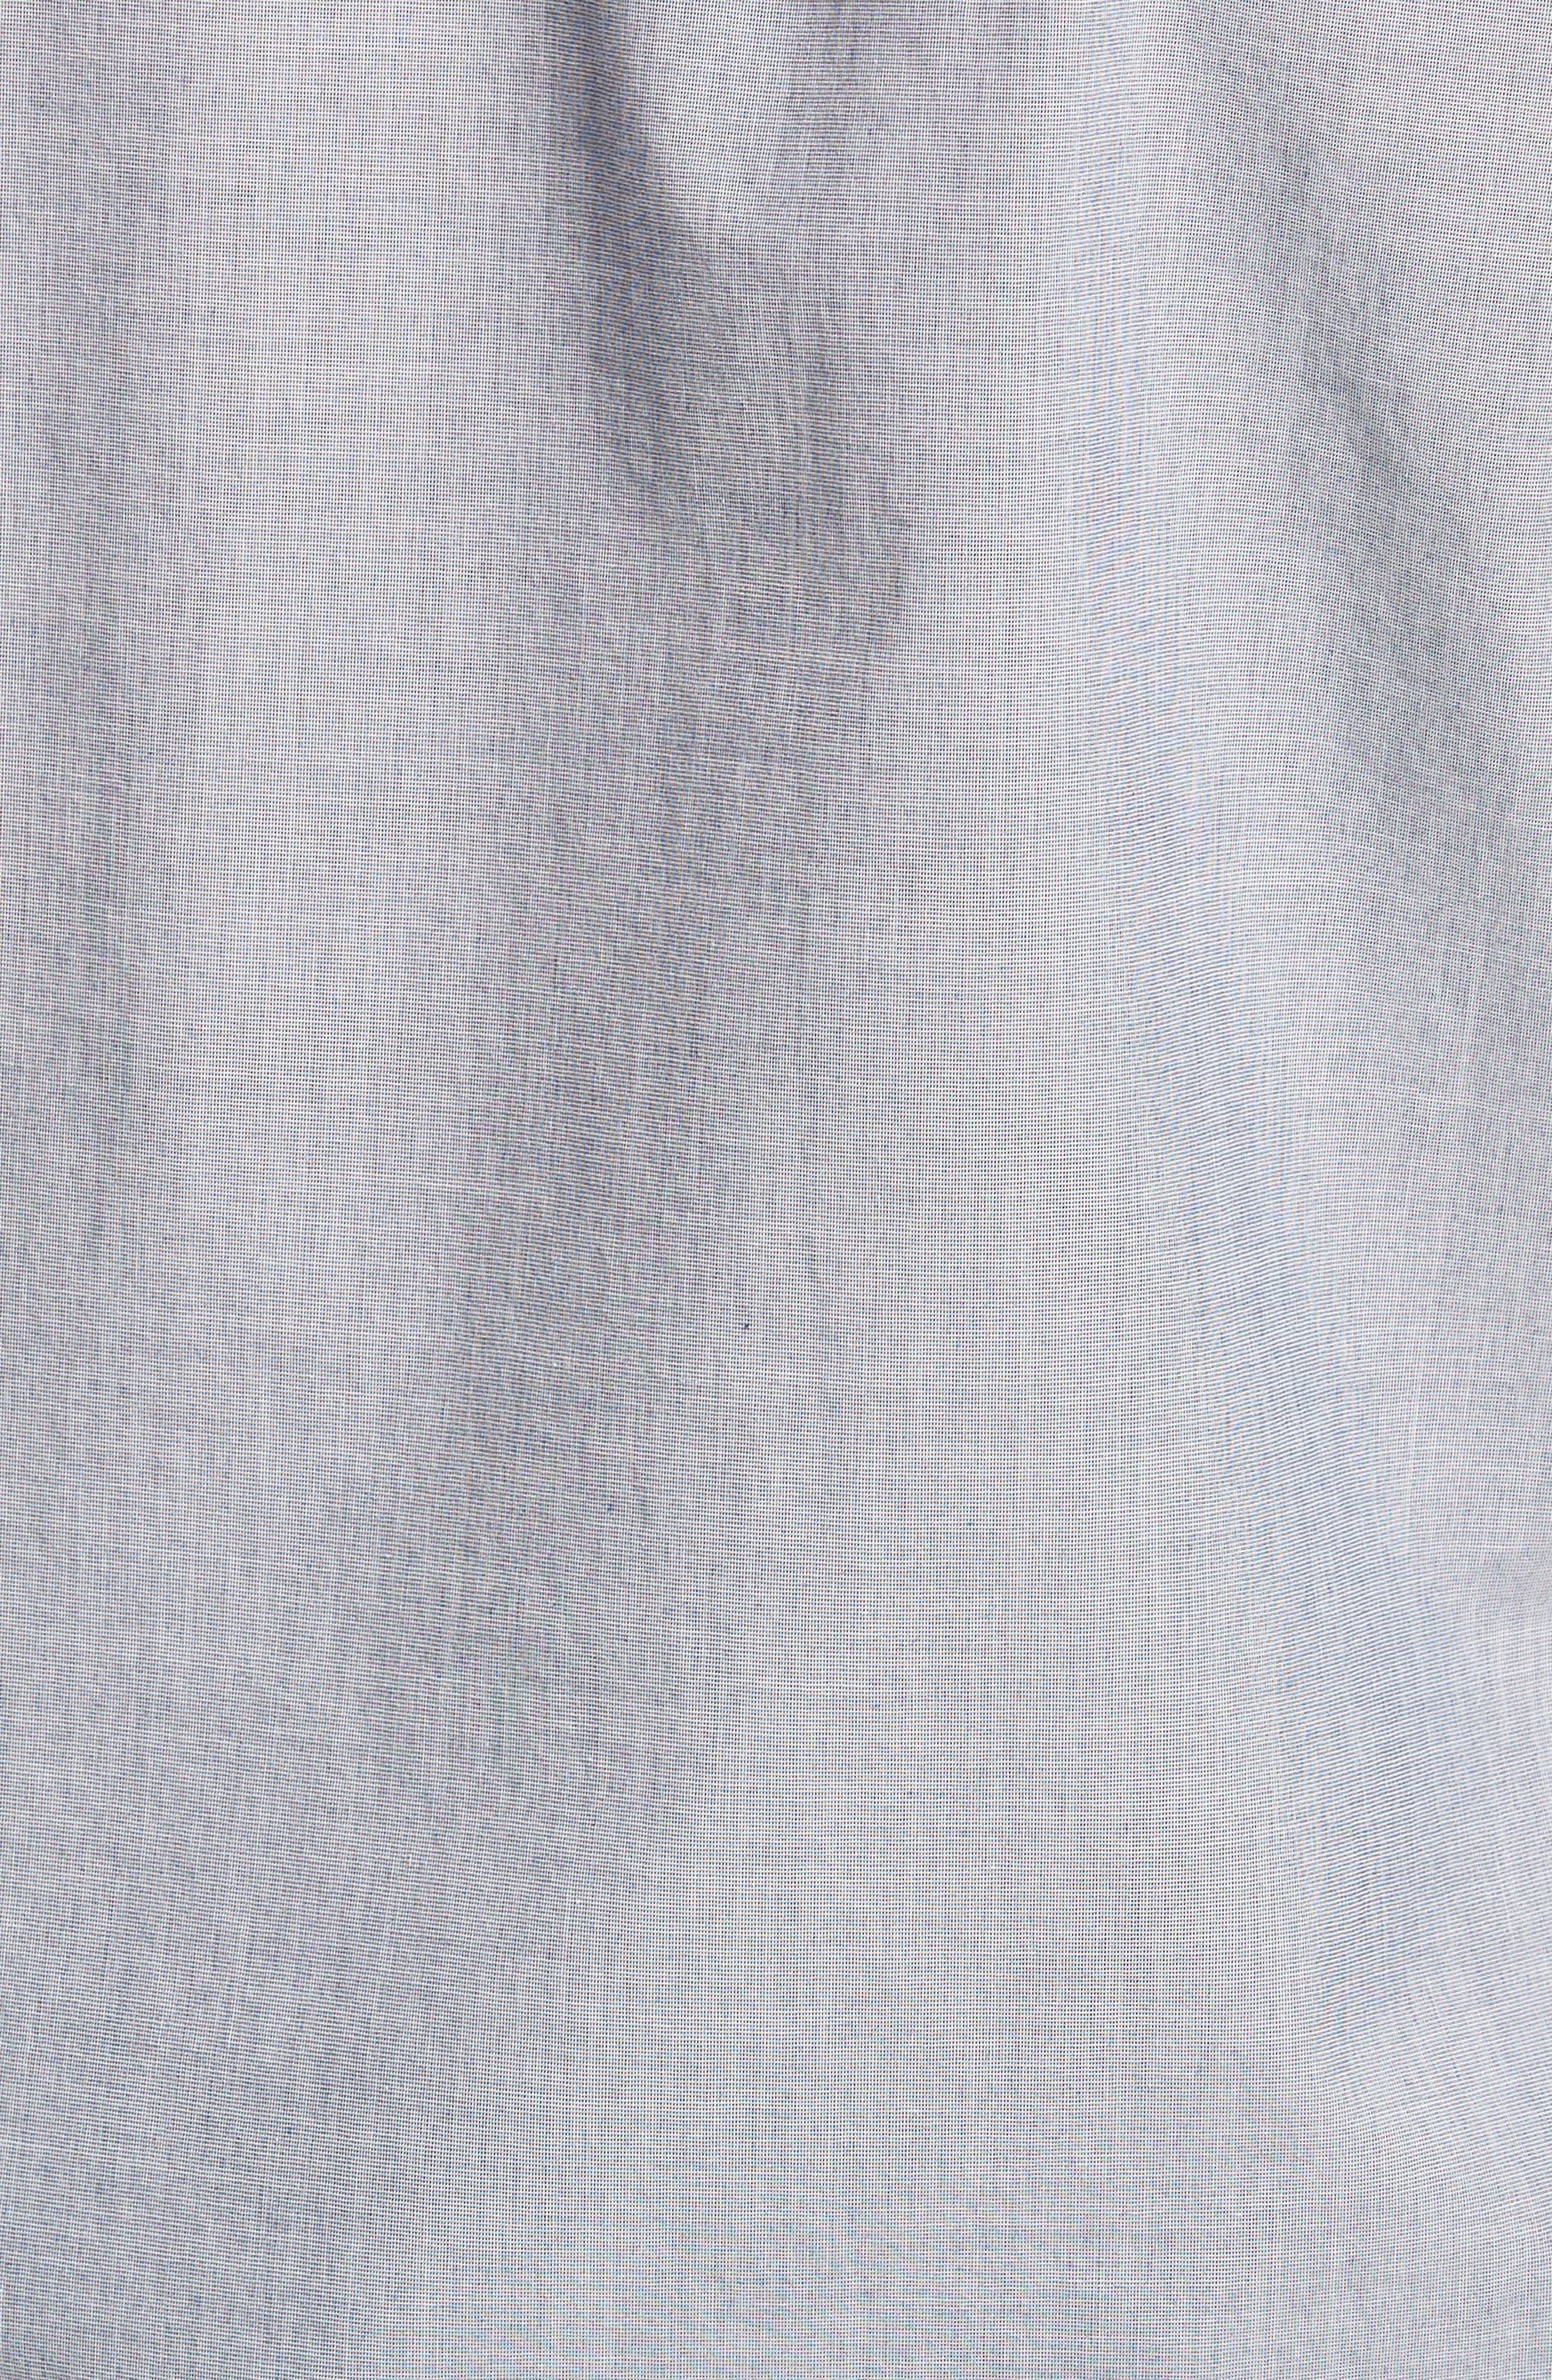 Summerweight Slim Fit Sport Shirt,                             Alternate thumbnail 5, color,                             End On End Solid - Blue Depths